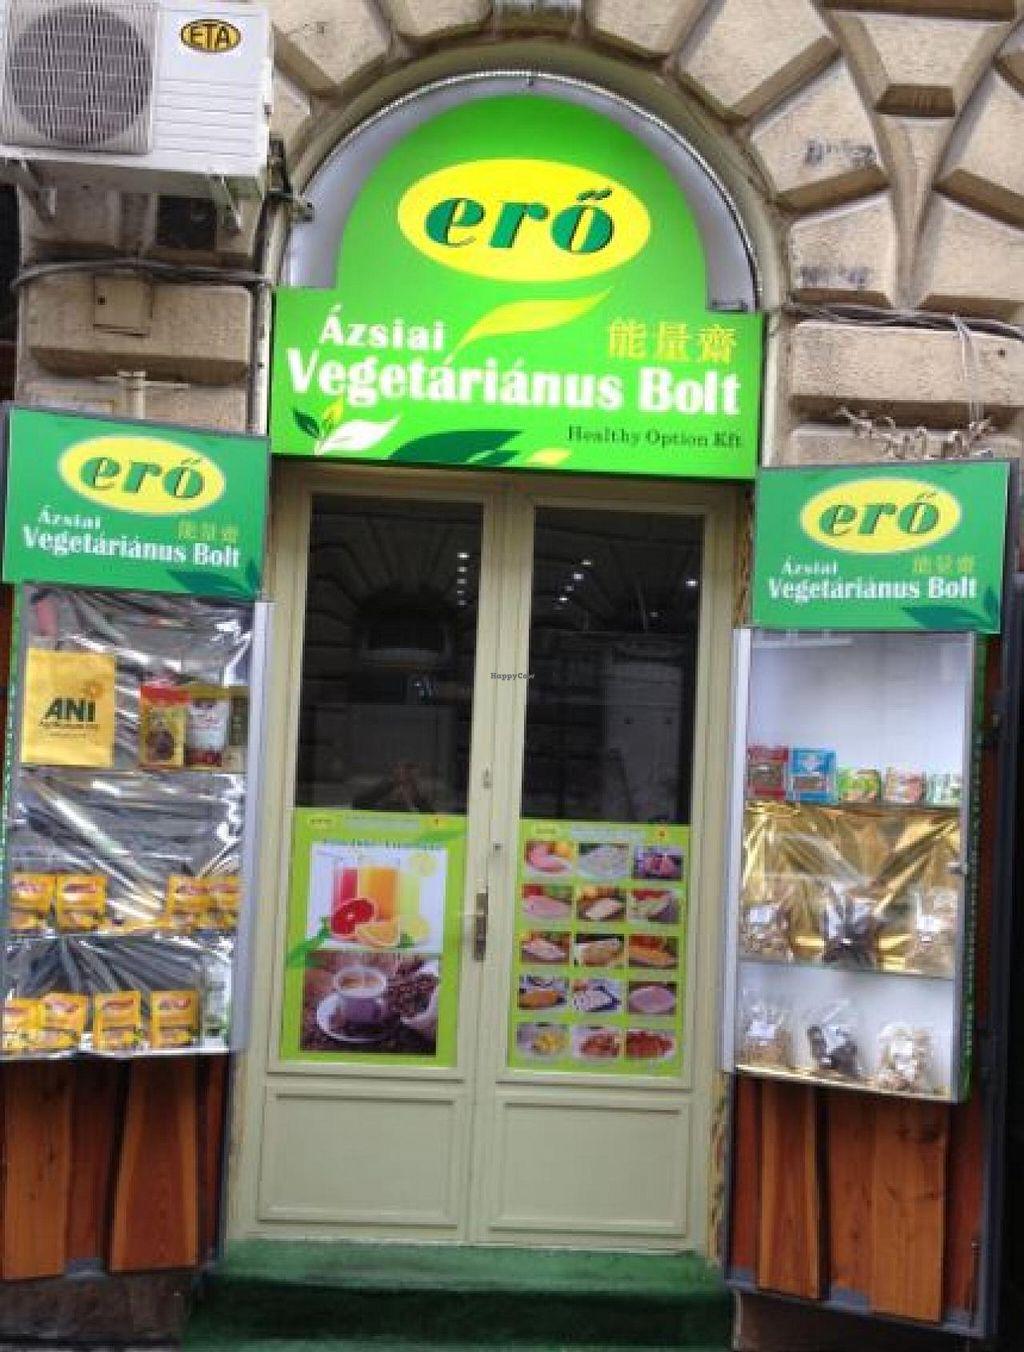 "Photo of Ero Azsiai Vegetarianus Bolt  by <a href=""/members/profile/jaimetiu"">jaimetiu</a> <br/>Ero Vegetarianus Bolt Vegan Vegetarian shop <br/> February 6, 2015  - <a href='/contact/abuse/image/55366/92338'>Report</a>"